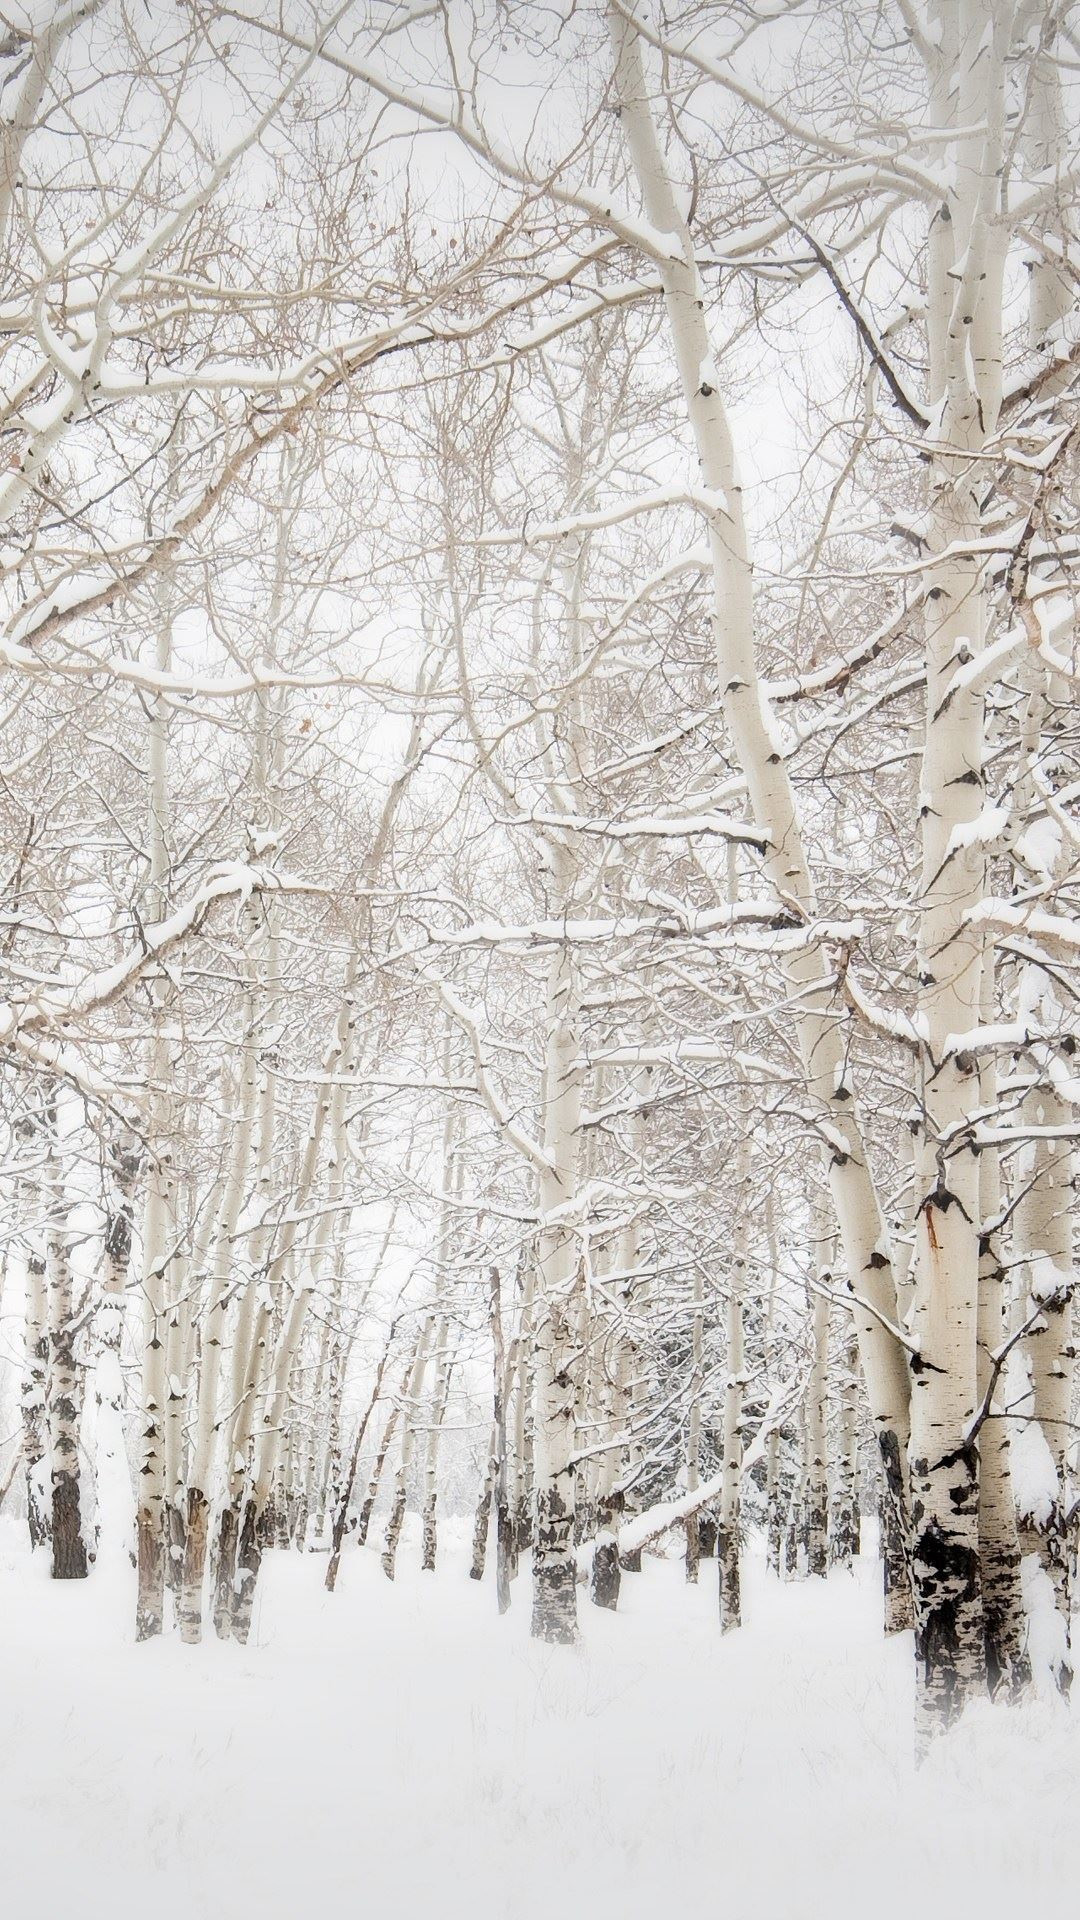 Birch Trees Winter Landscape iPhone 6 wallpaper